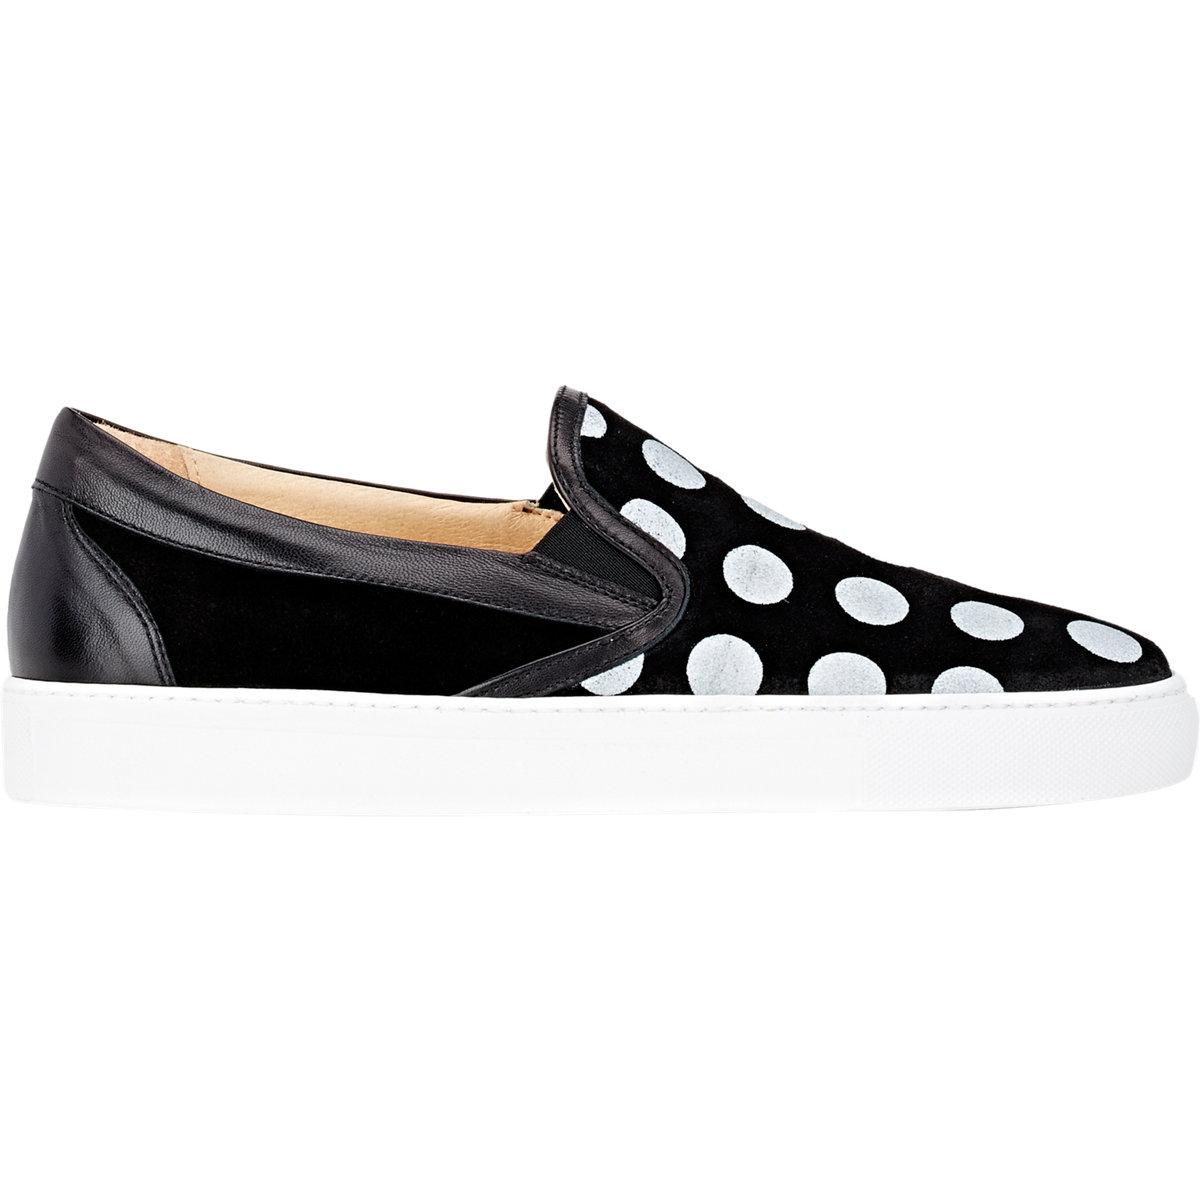 Castaner Shoes New York